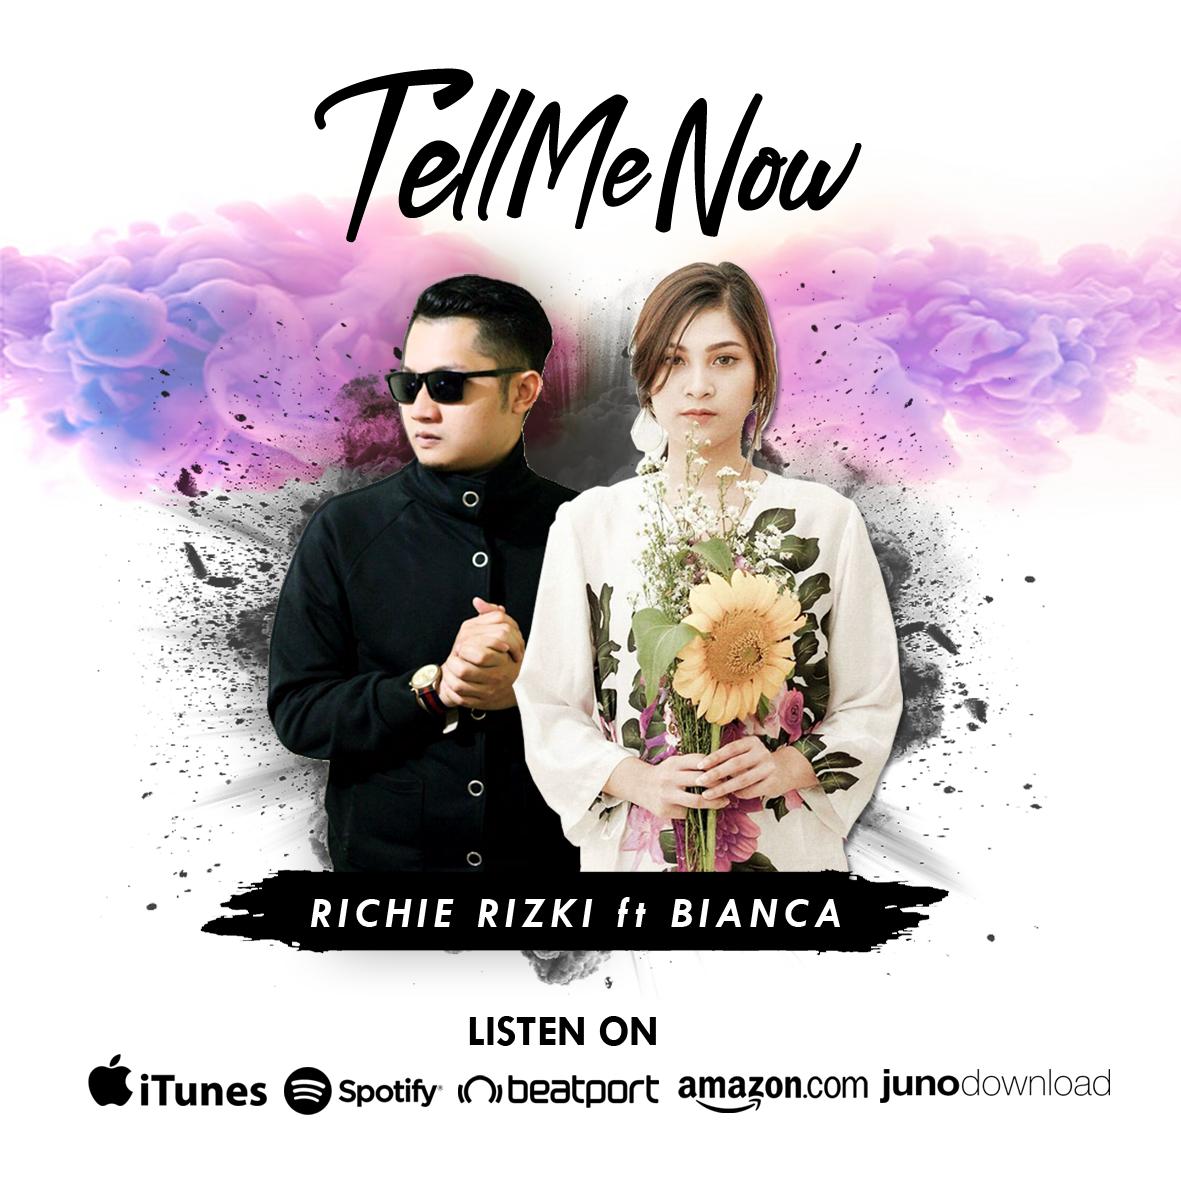 Resident DJ Babyface, Richie Rizki gandeng Fasyabianca dalam Single 'Tell Me Now'